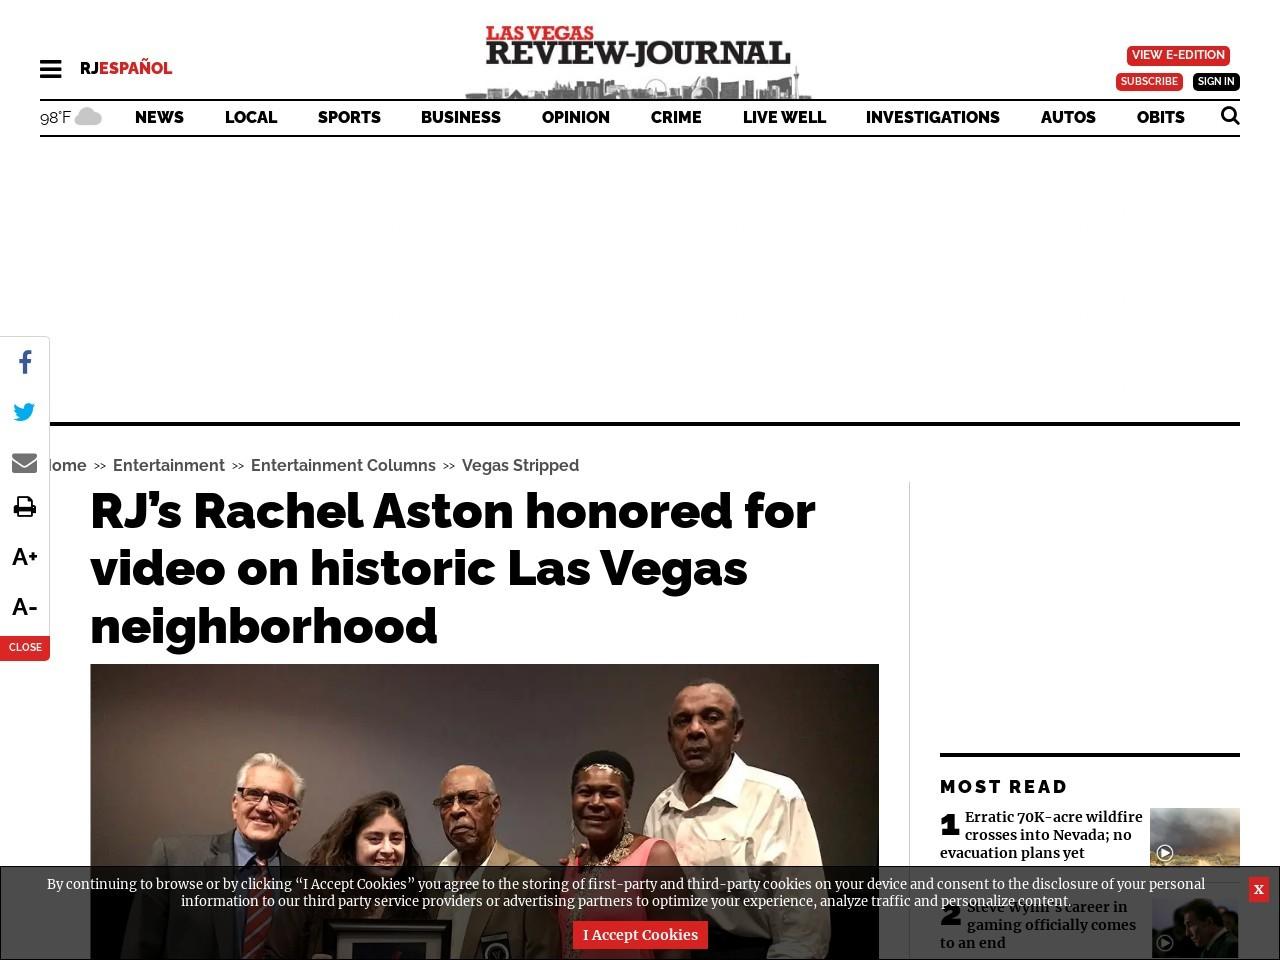 RJ's Rachel Aston honored for video on historic Las Vegas neighborhood